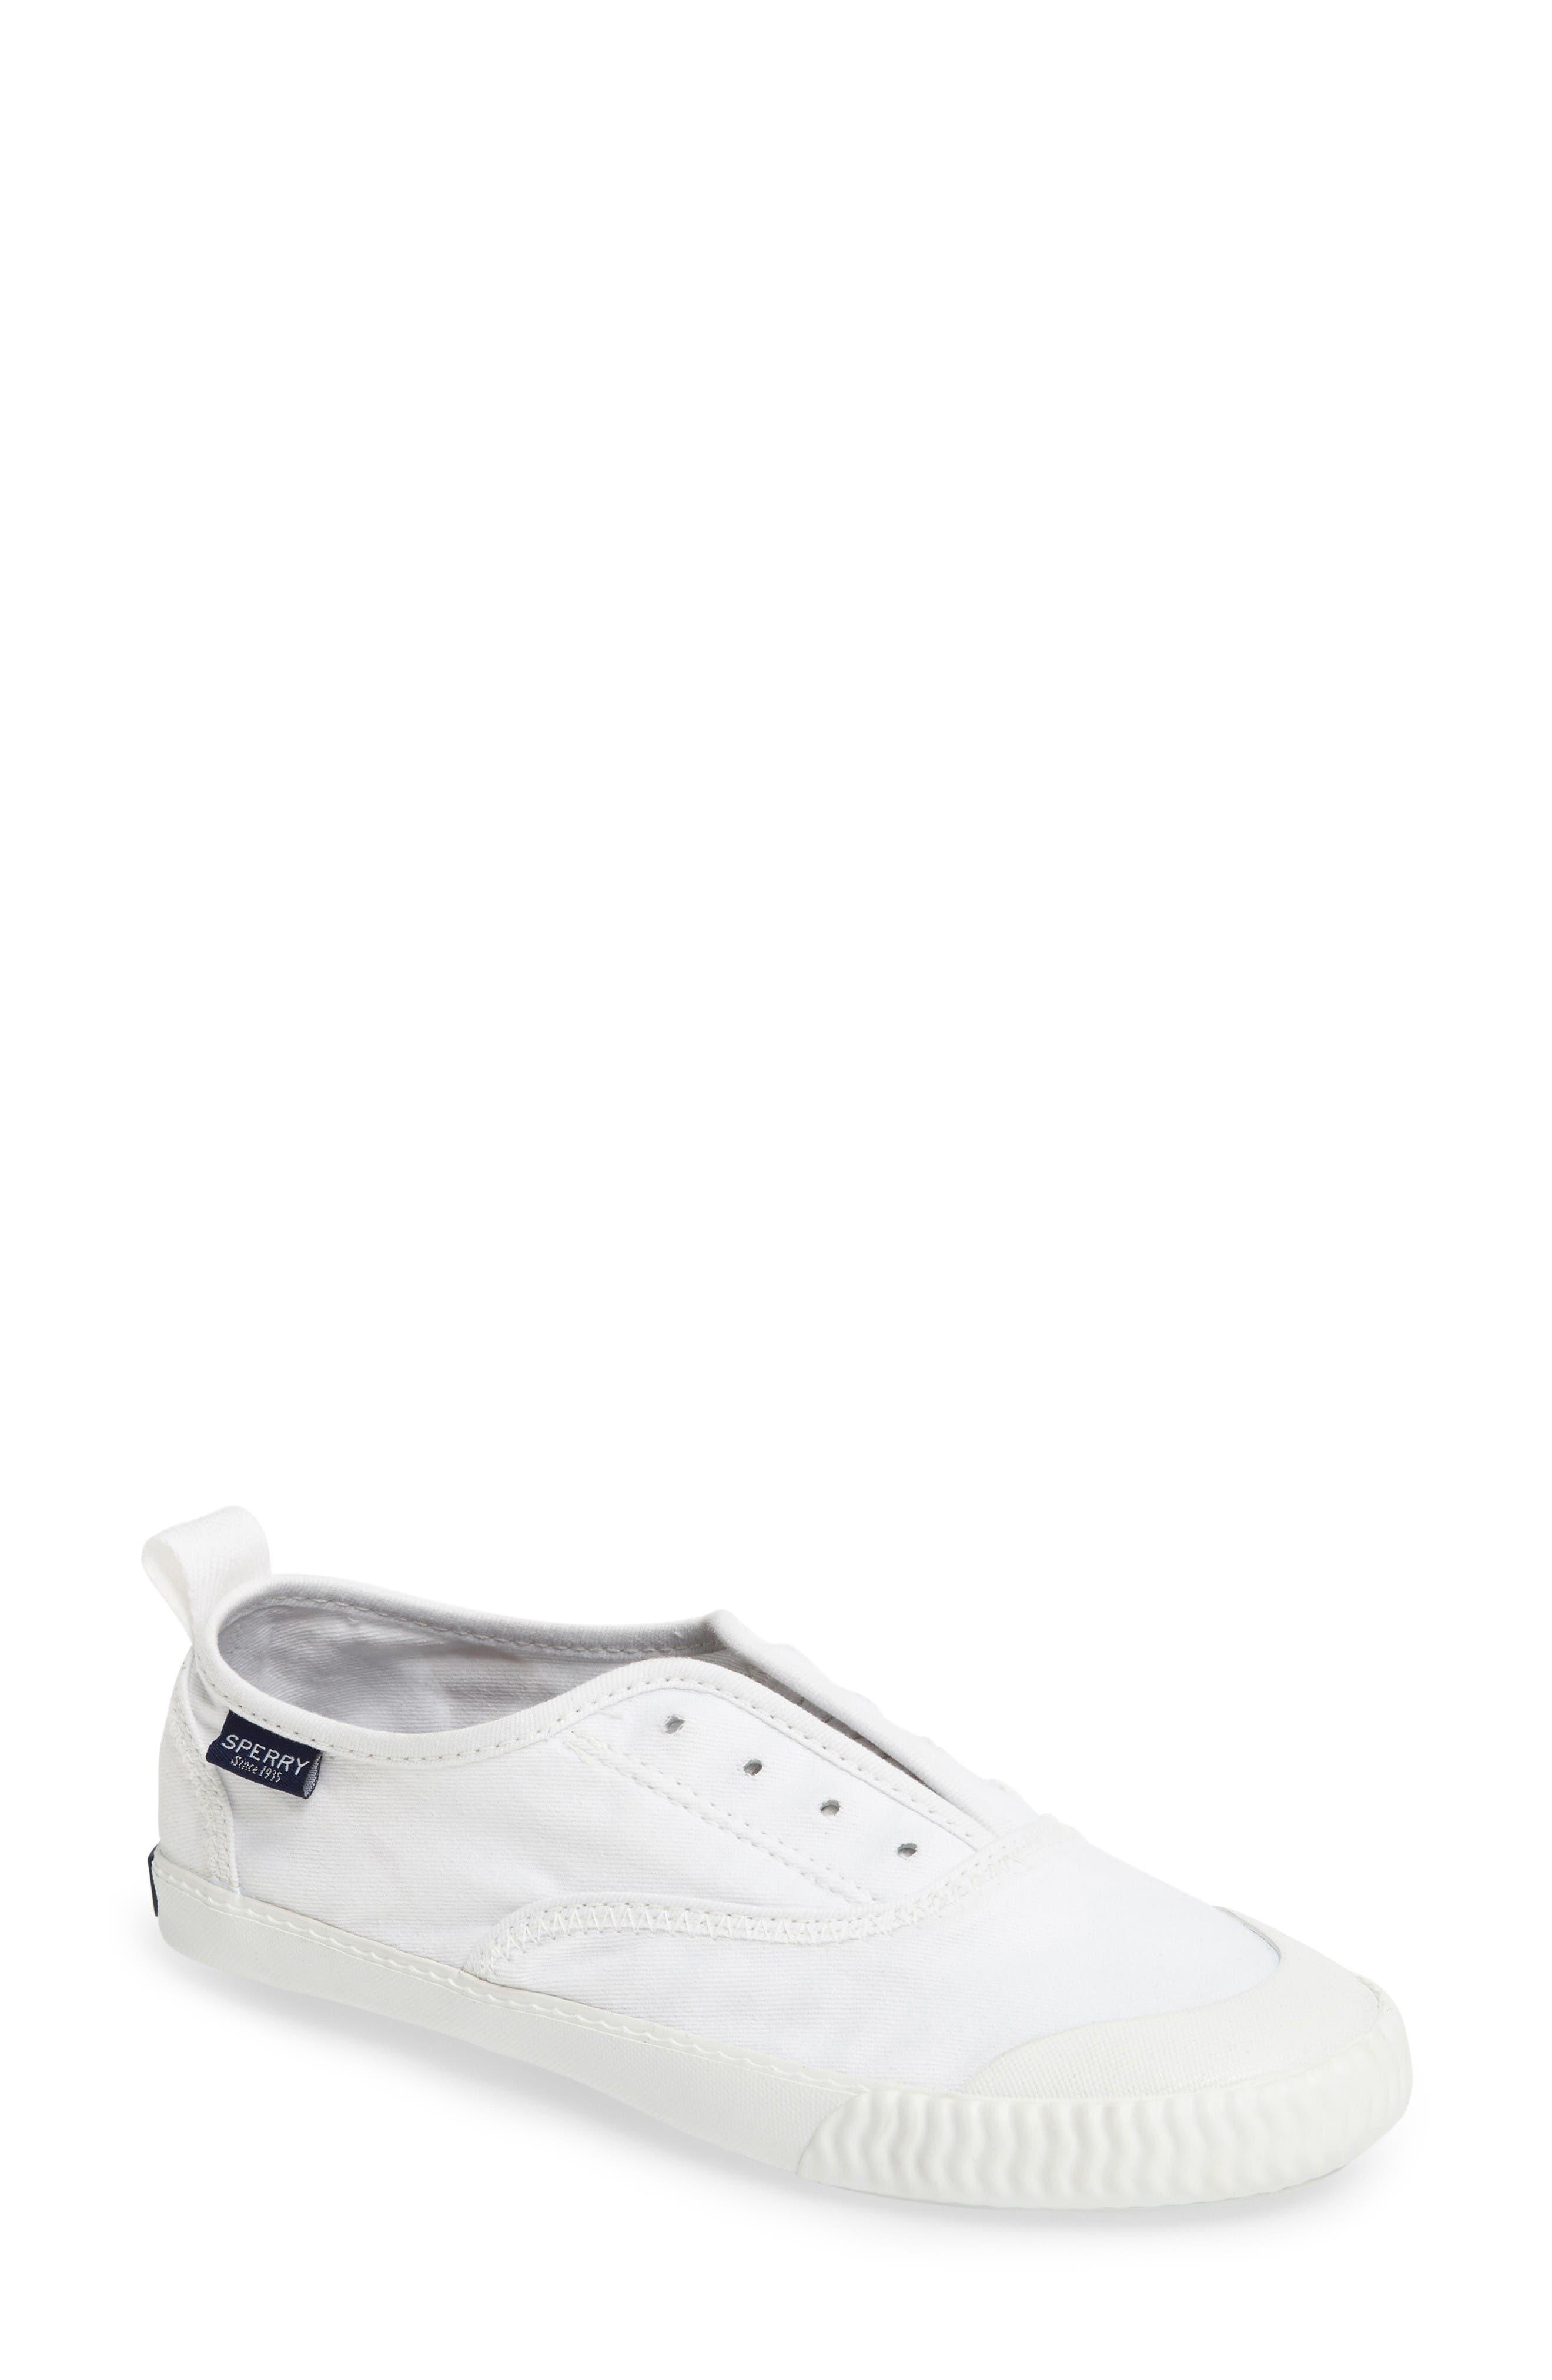 Sayel Slip-On Sneaker,                         Main,                         color, White Fabric